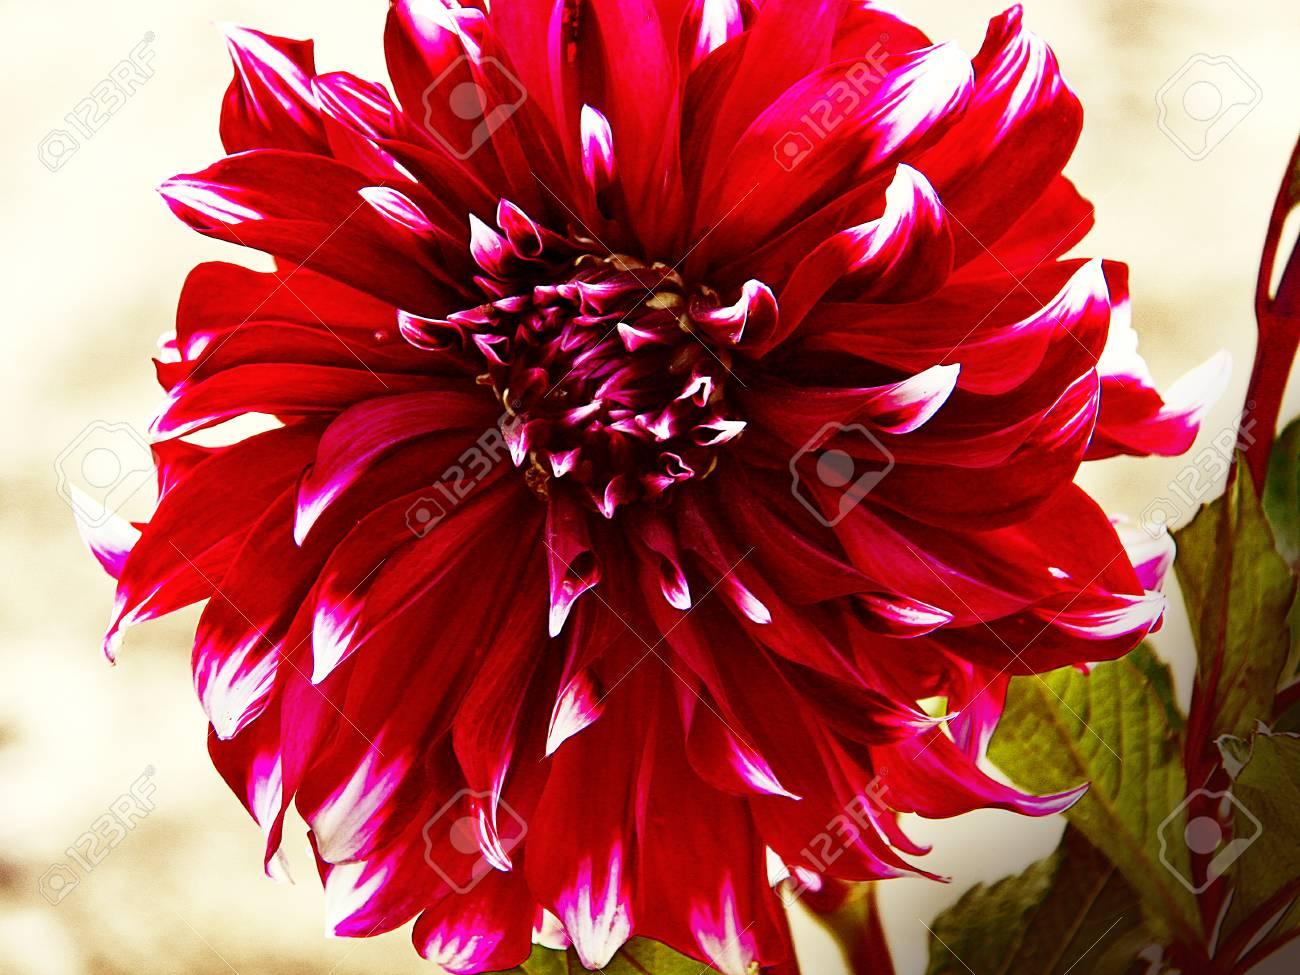 Beautiful variegated dahlia flower red petals with white tips beautiful variegated dahlia flower red petals with white tips against a blurred background stock photo mightylinksfo